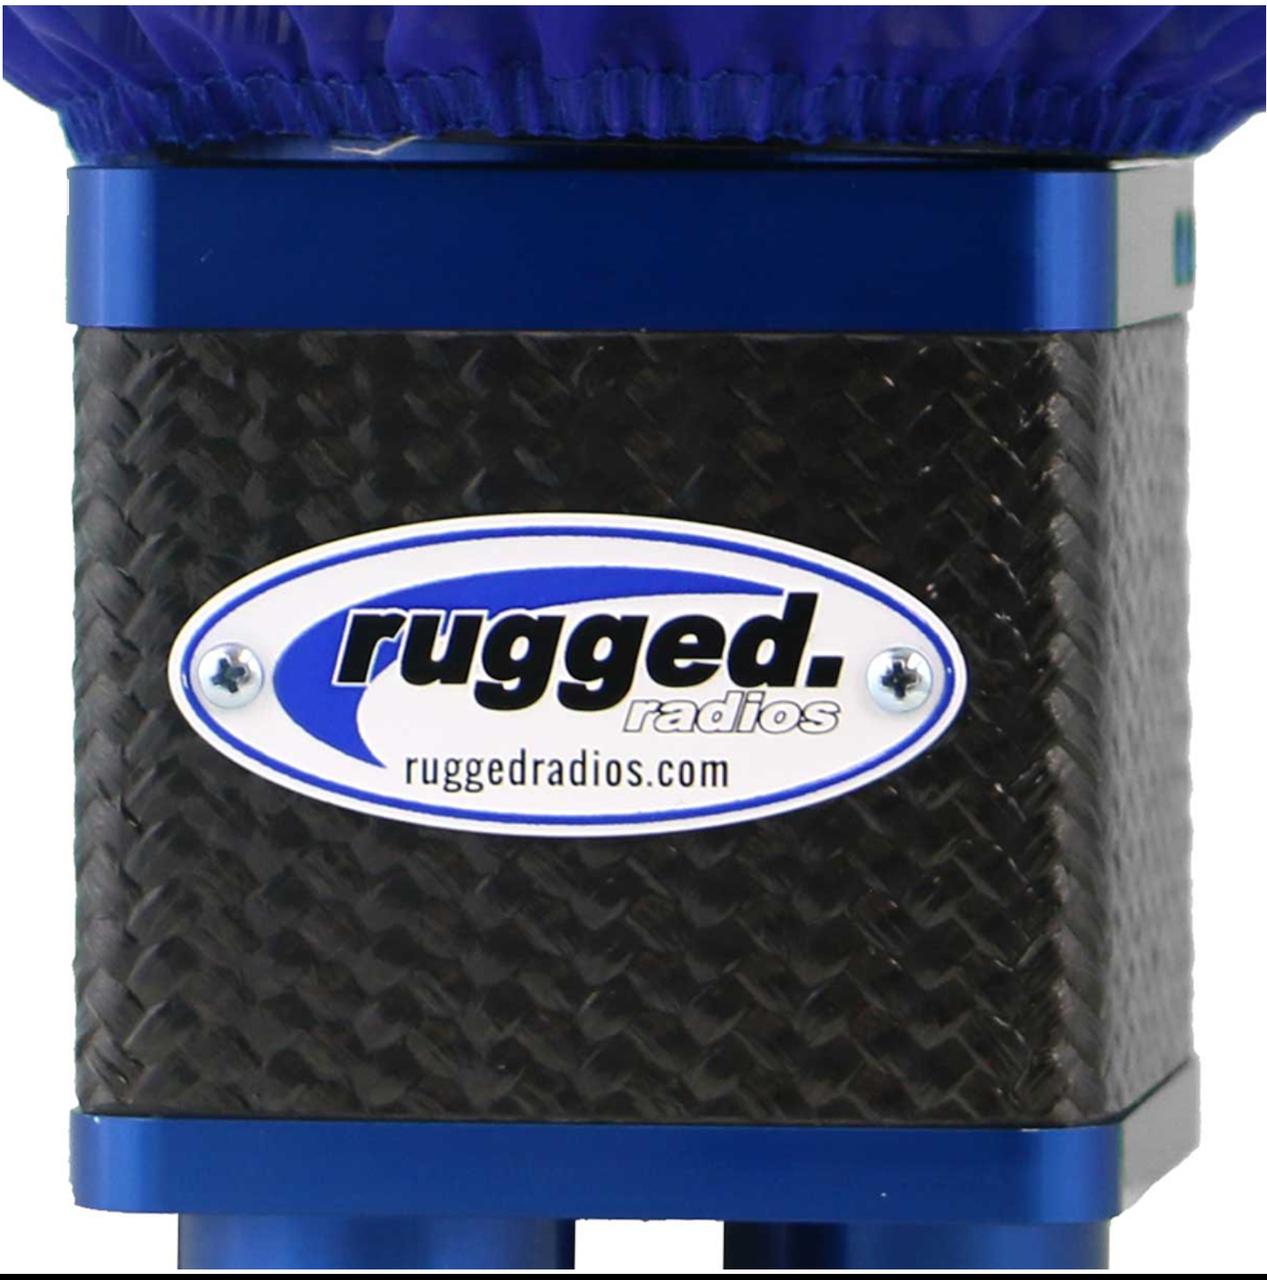 Rugged Radios MAC3.2 M3 Extreme Air Pumper System Two Person Fresh Air Pumper for Forced Air Helmets